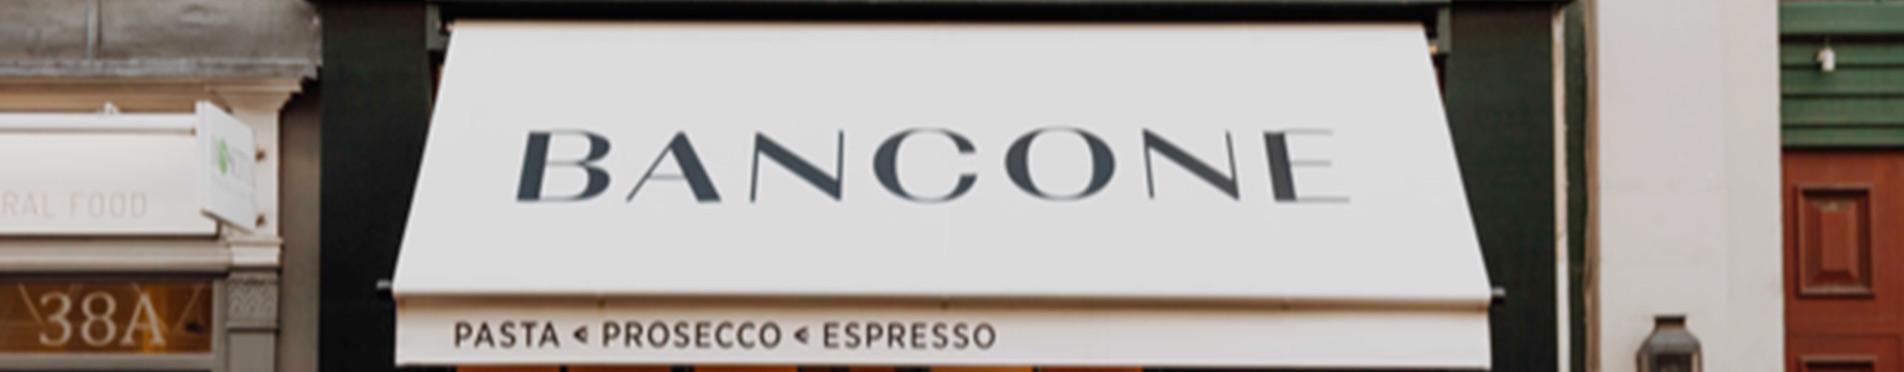 Bancone Italian restaurant in London Covent Garden